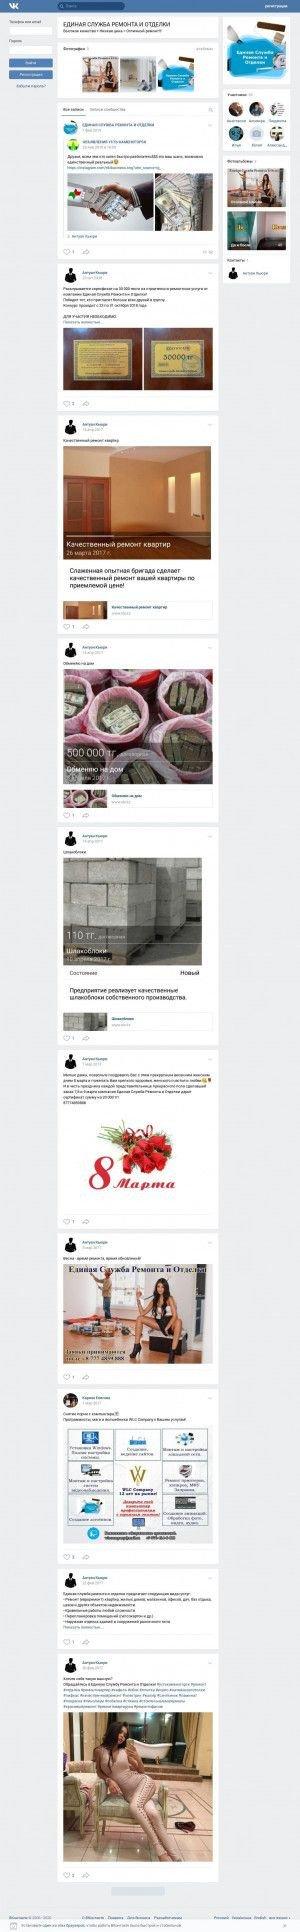 Предпросмотр для vk.com — АлтайКурылысГрупп